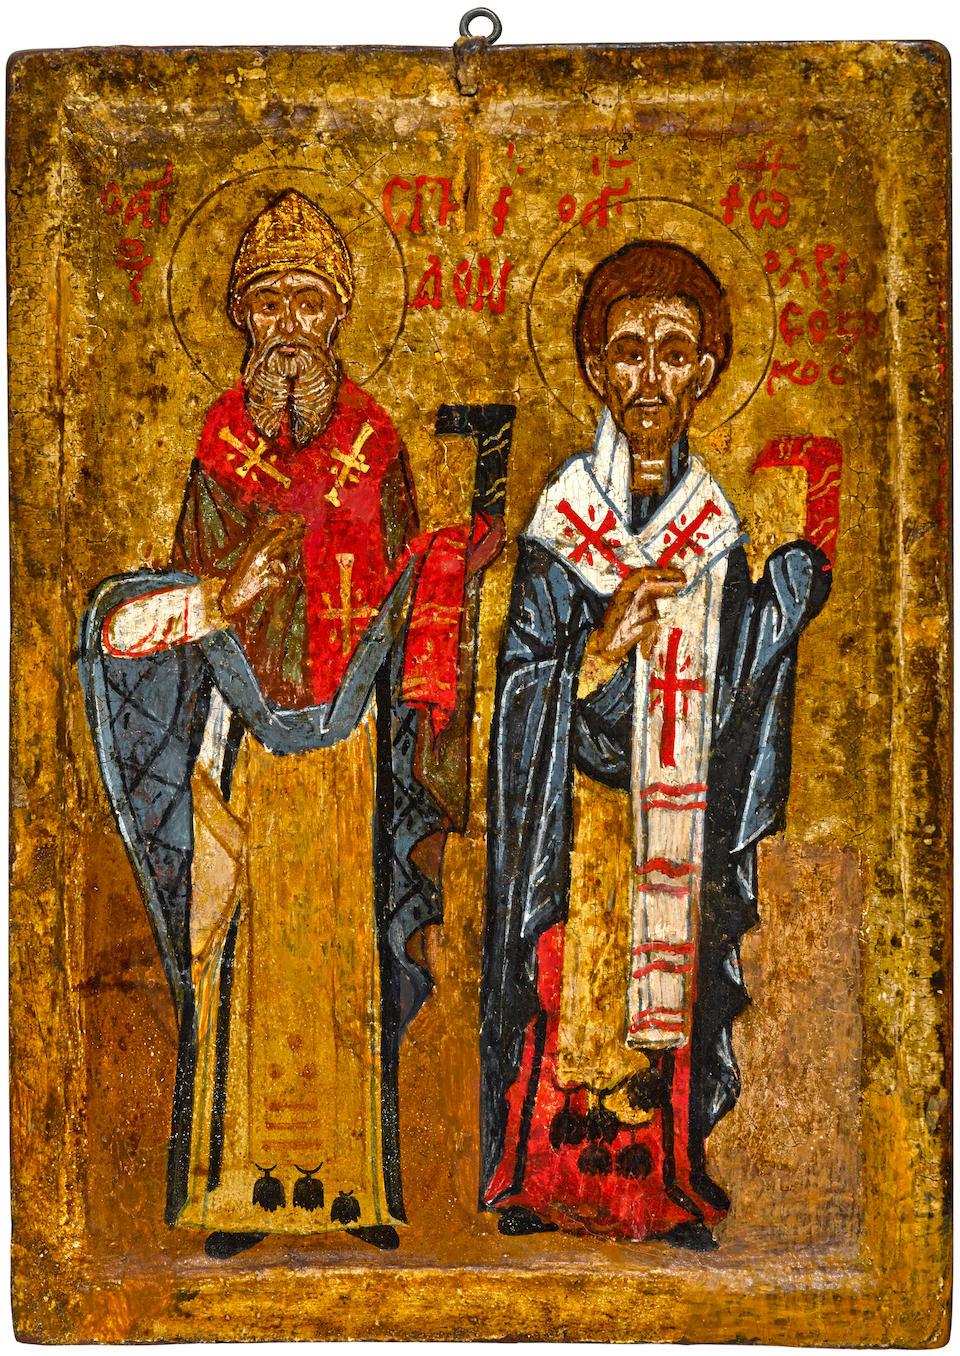 A two-sided icon with Saint Spiridon, Saint John Chrysostom and Saint John the EvangelistGreece, probably Crete, c. 1800